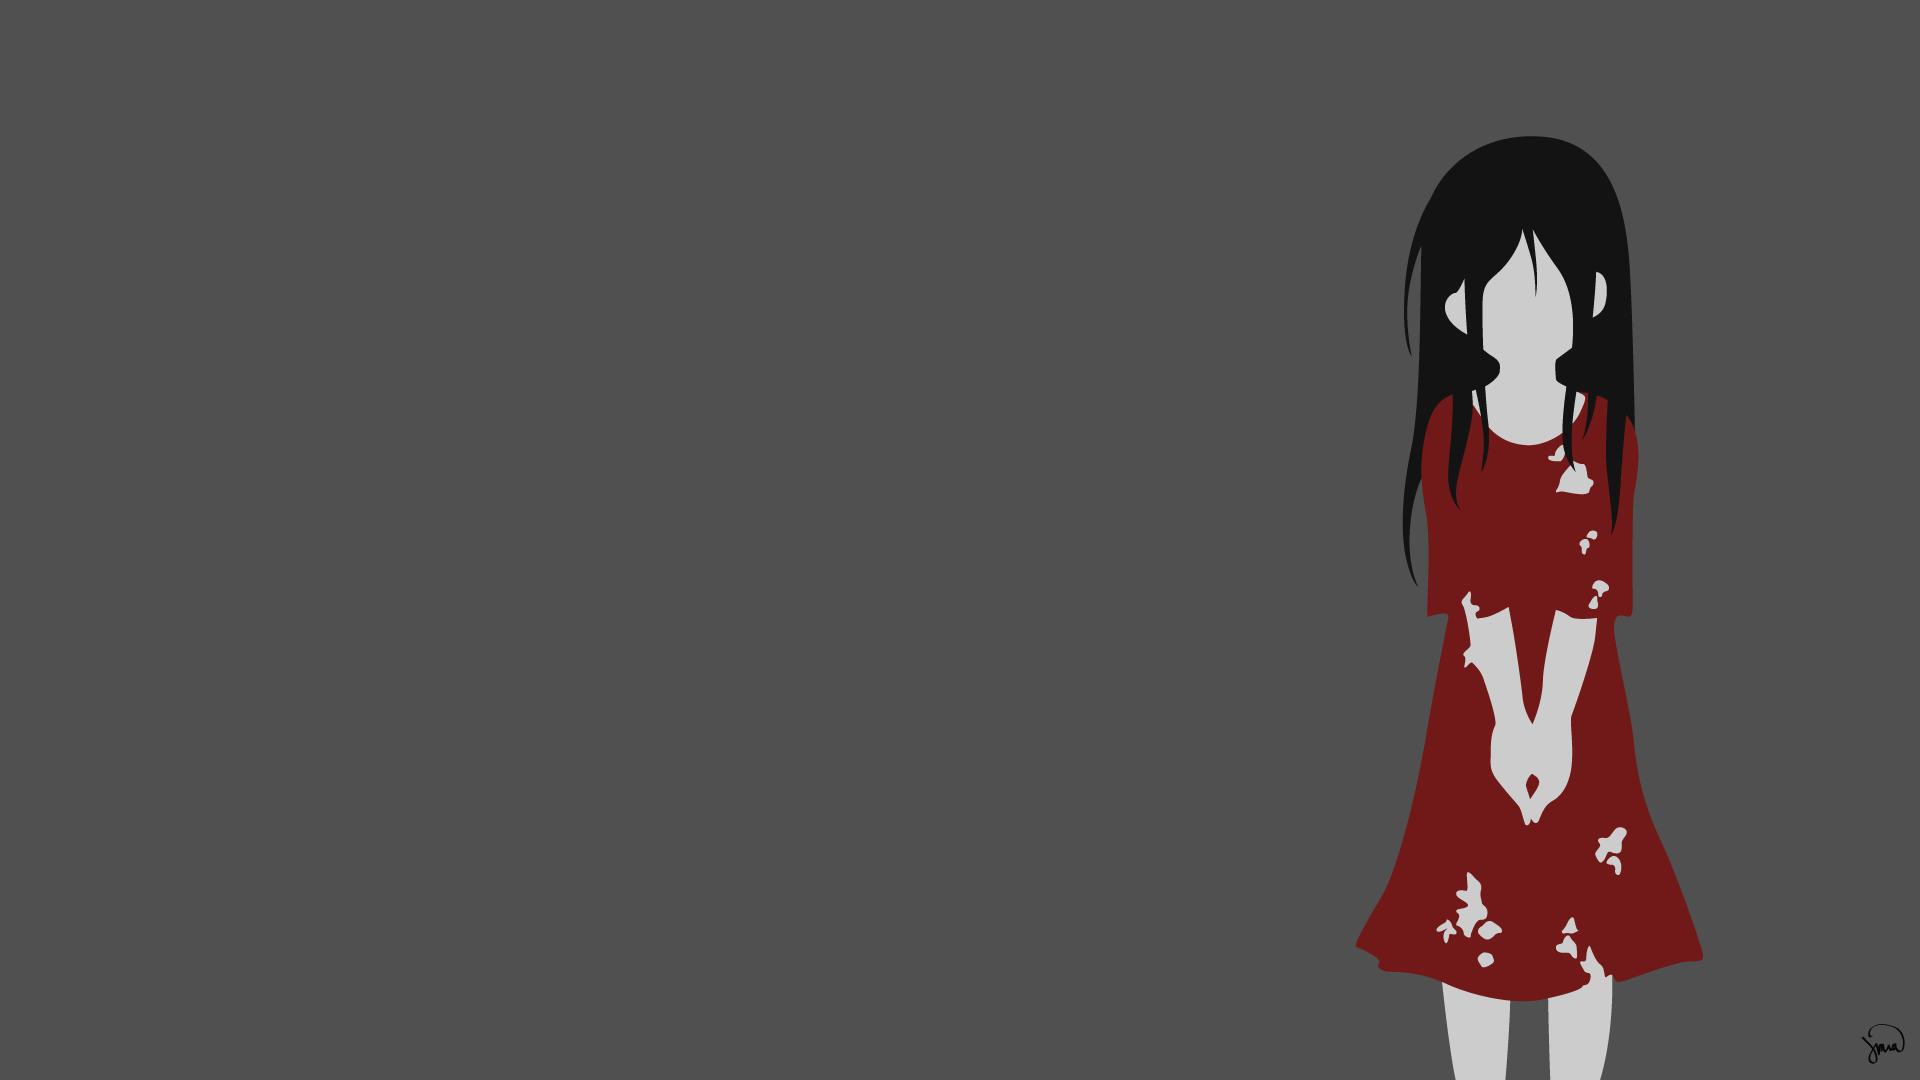 Corpse Party Wallpaper Hd Fondos De Pantalla Ilustraci 243 N Chicas Anime Dibujos